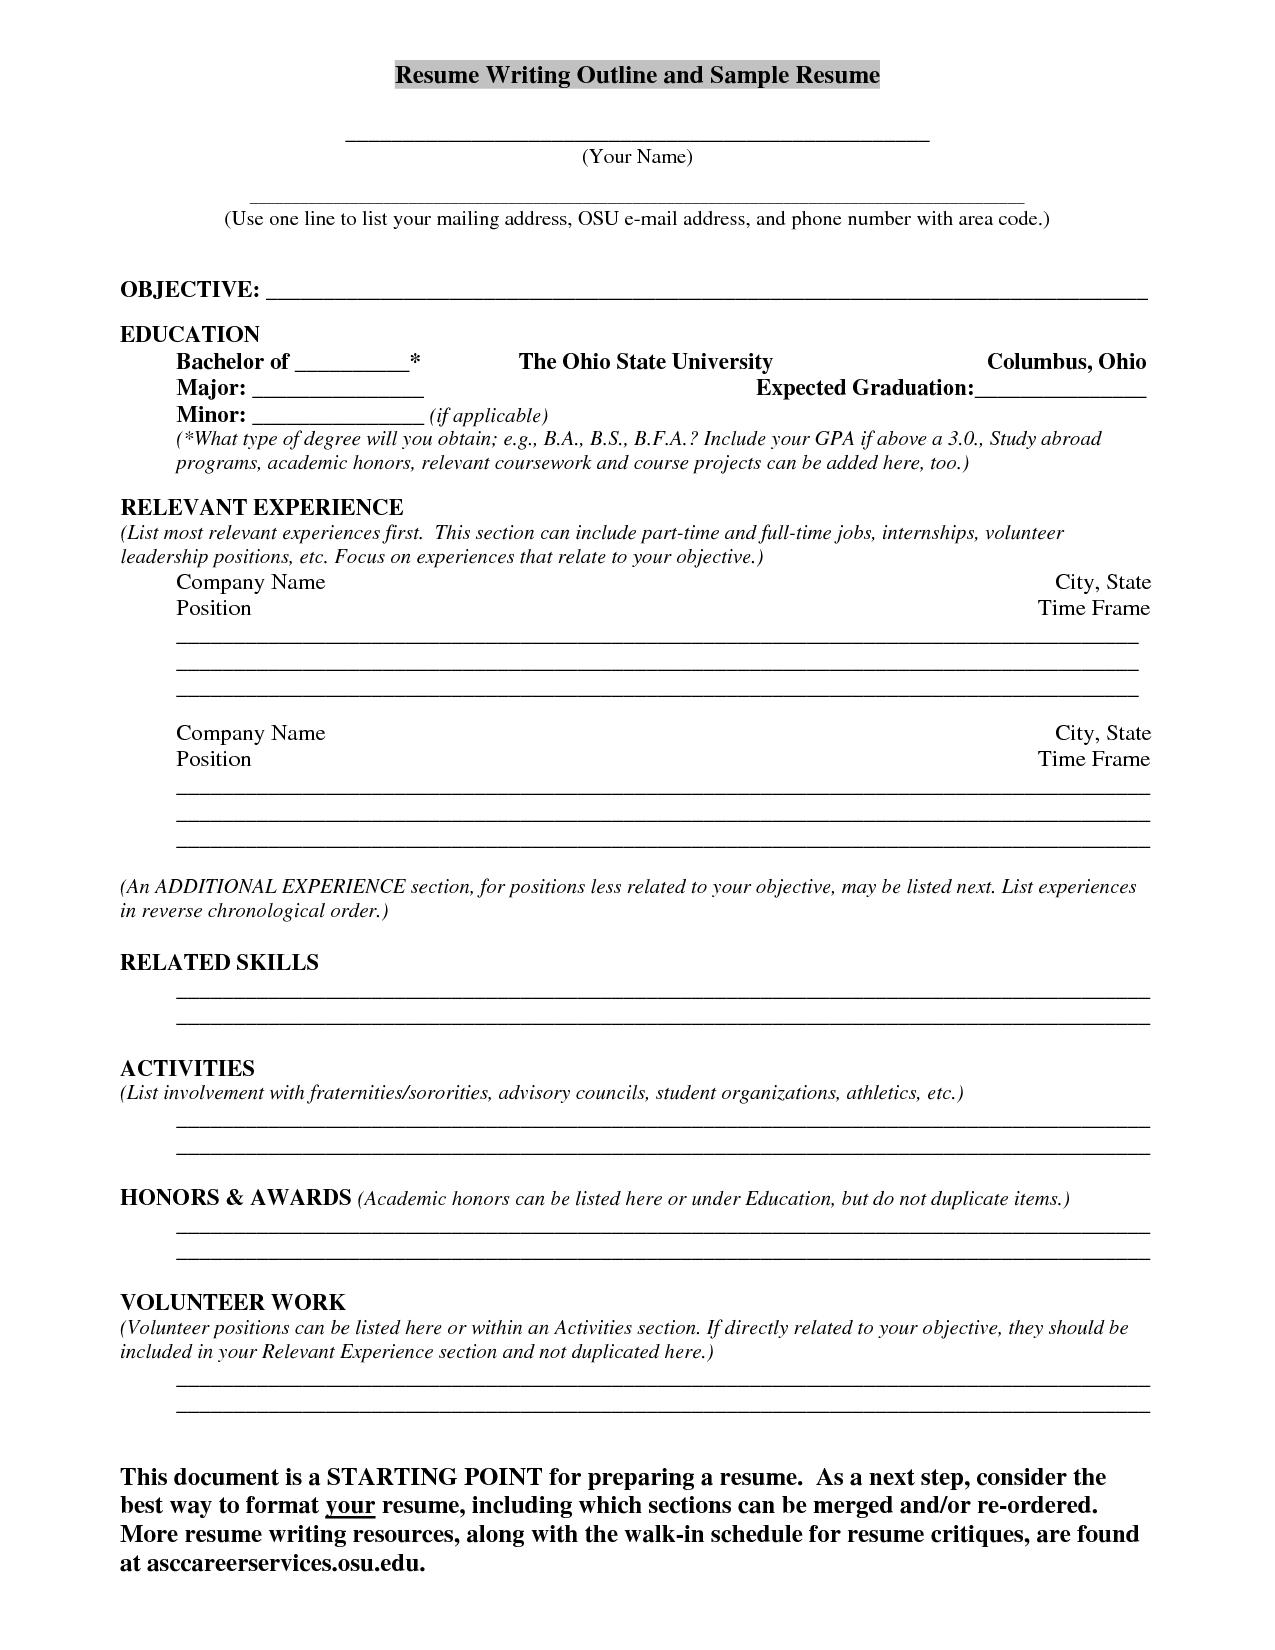 Helpful Hints · Resume Writing ...